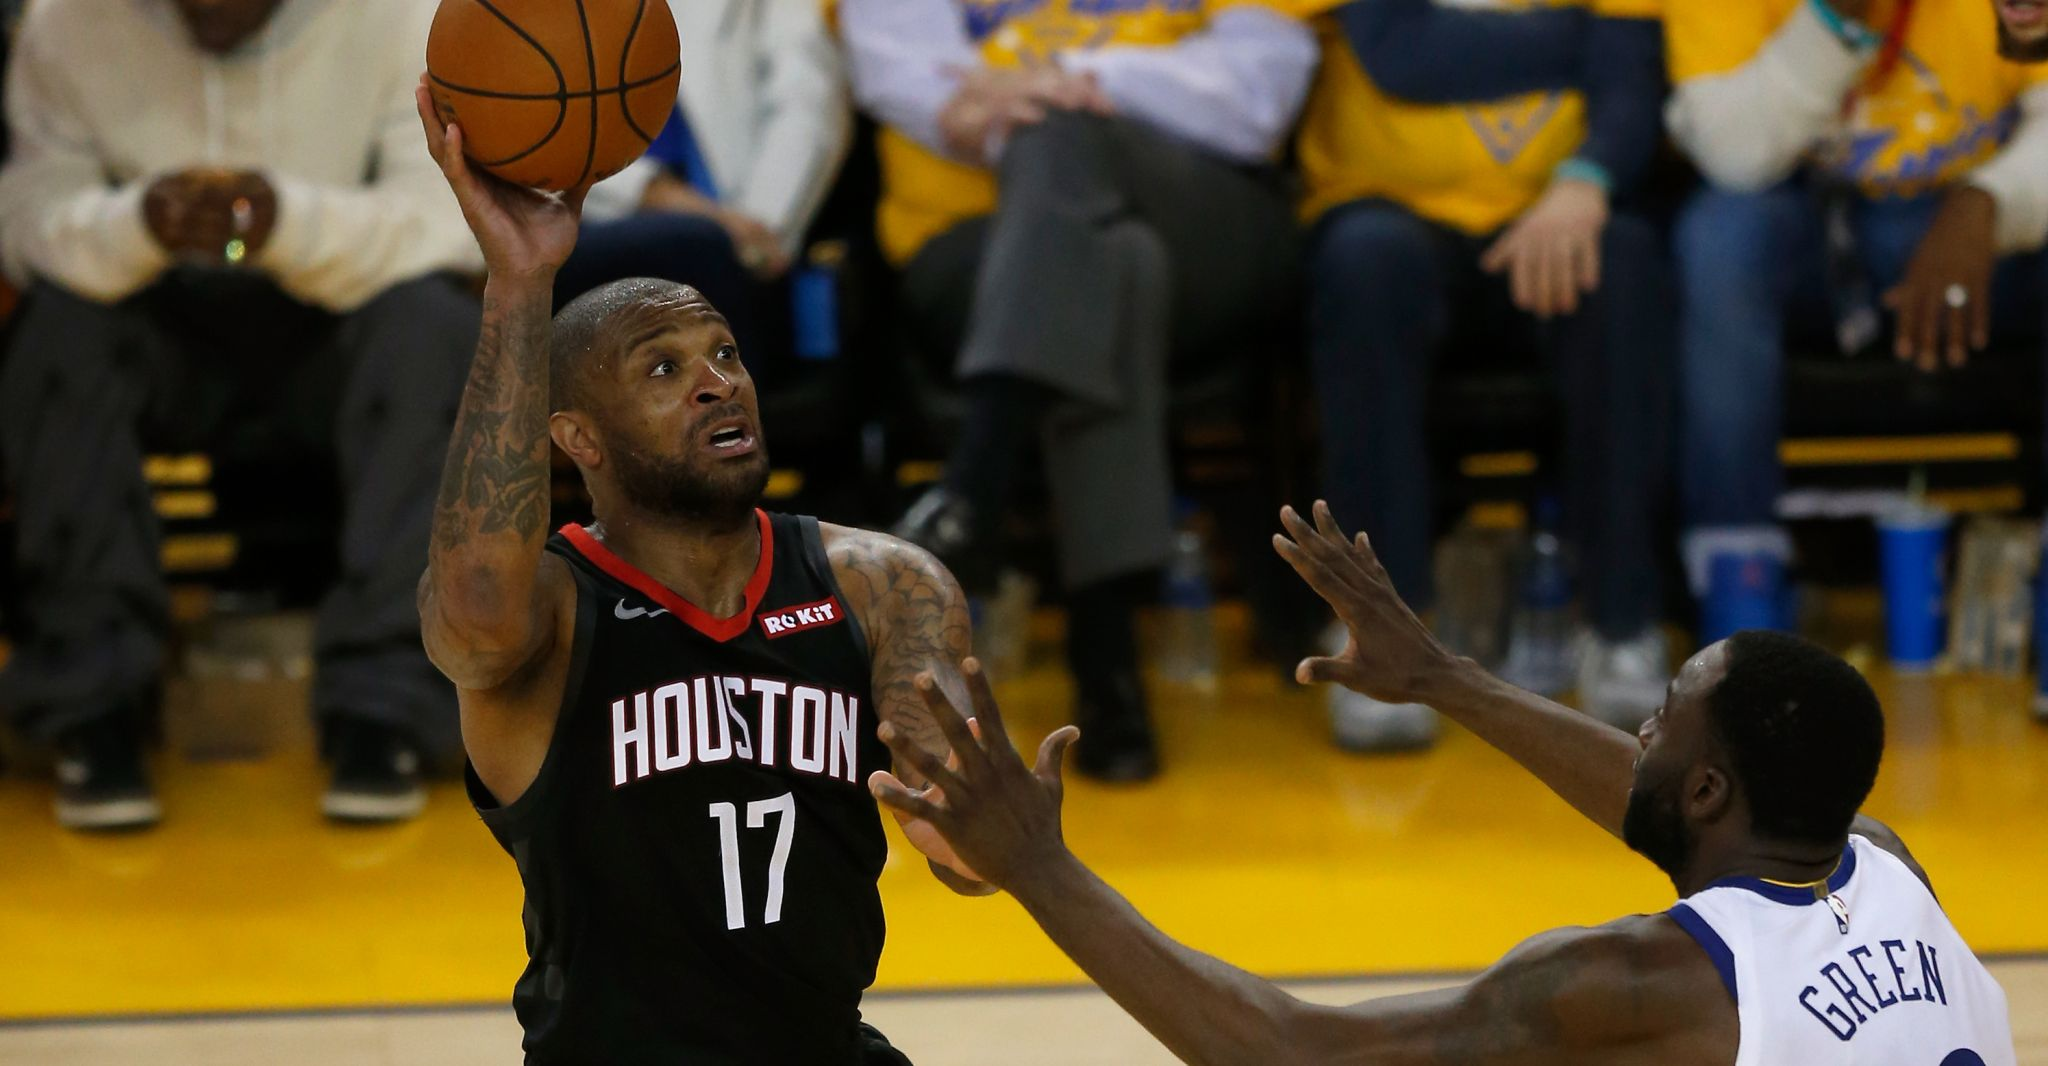 To Warriors' Draymond Green, P.J. Tucker makes Rockets' small lineup work